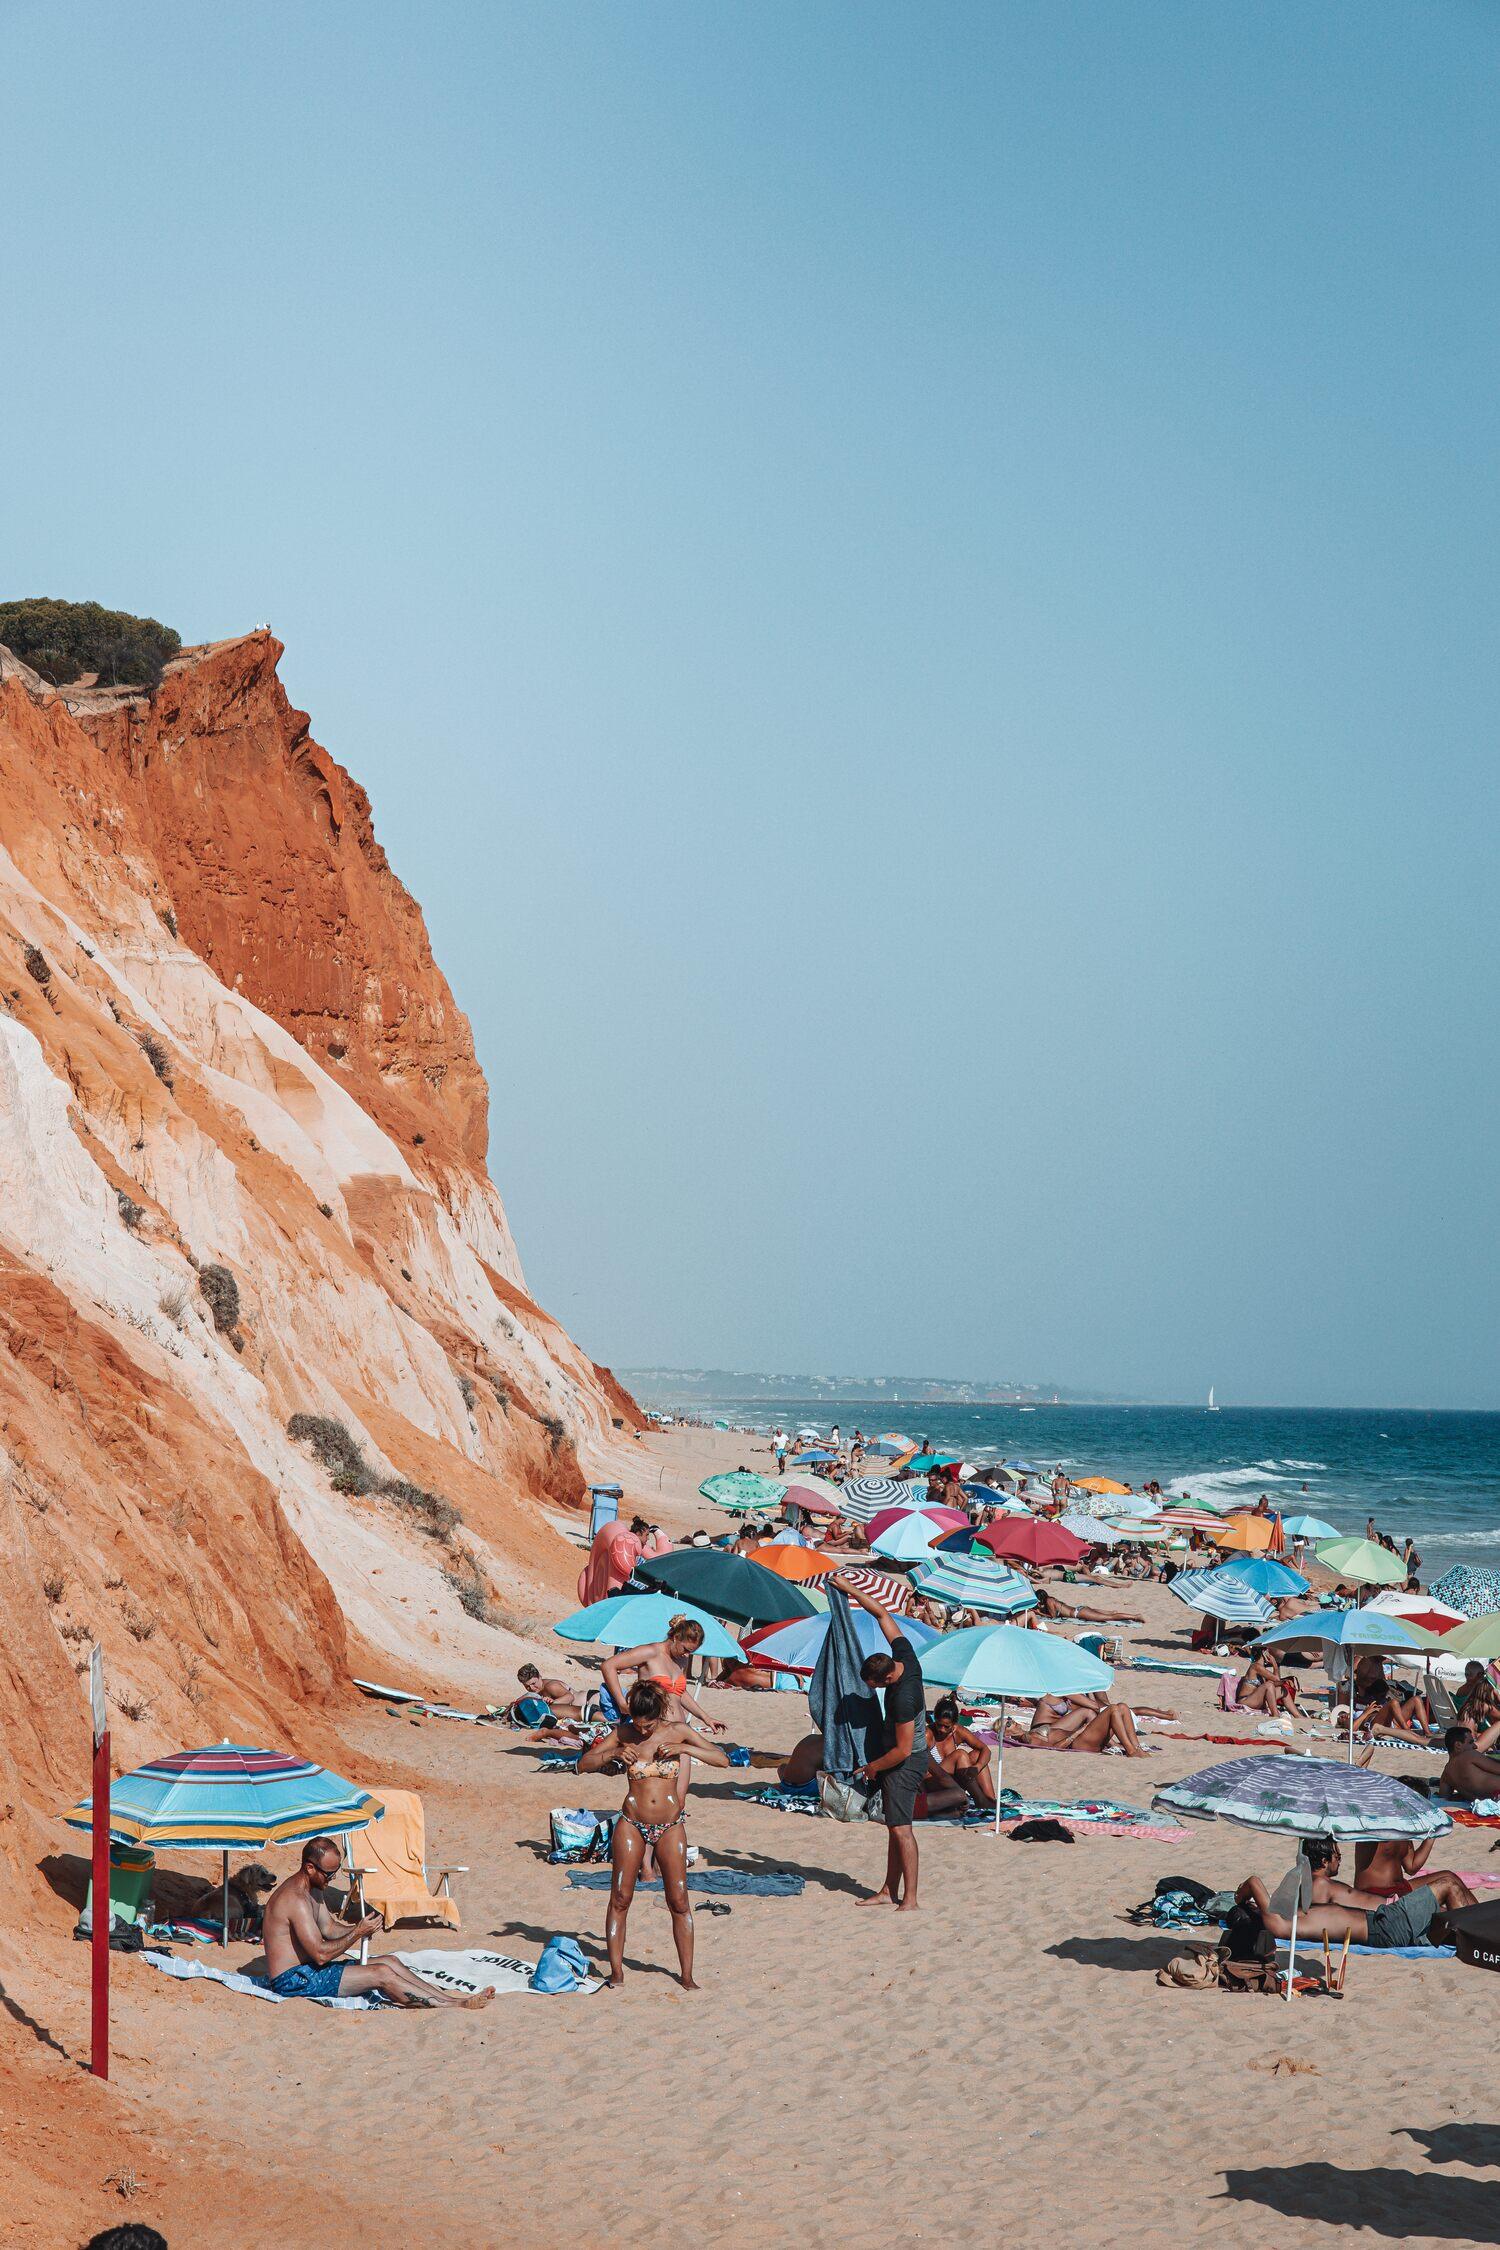 Praia da Falesia is a must visit location when venturing on a Portugal road trip of the coast